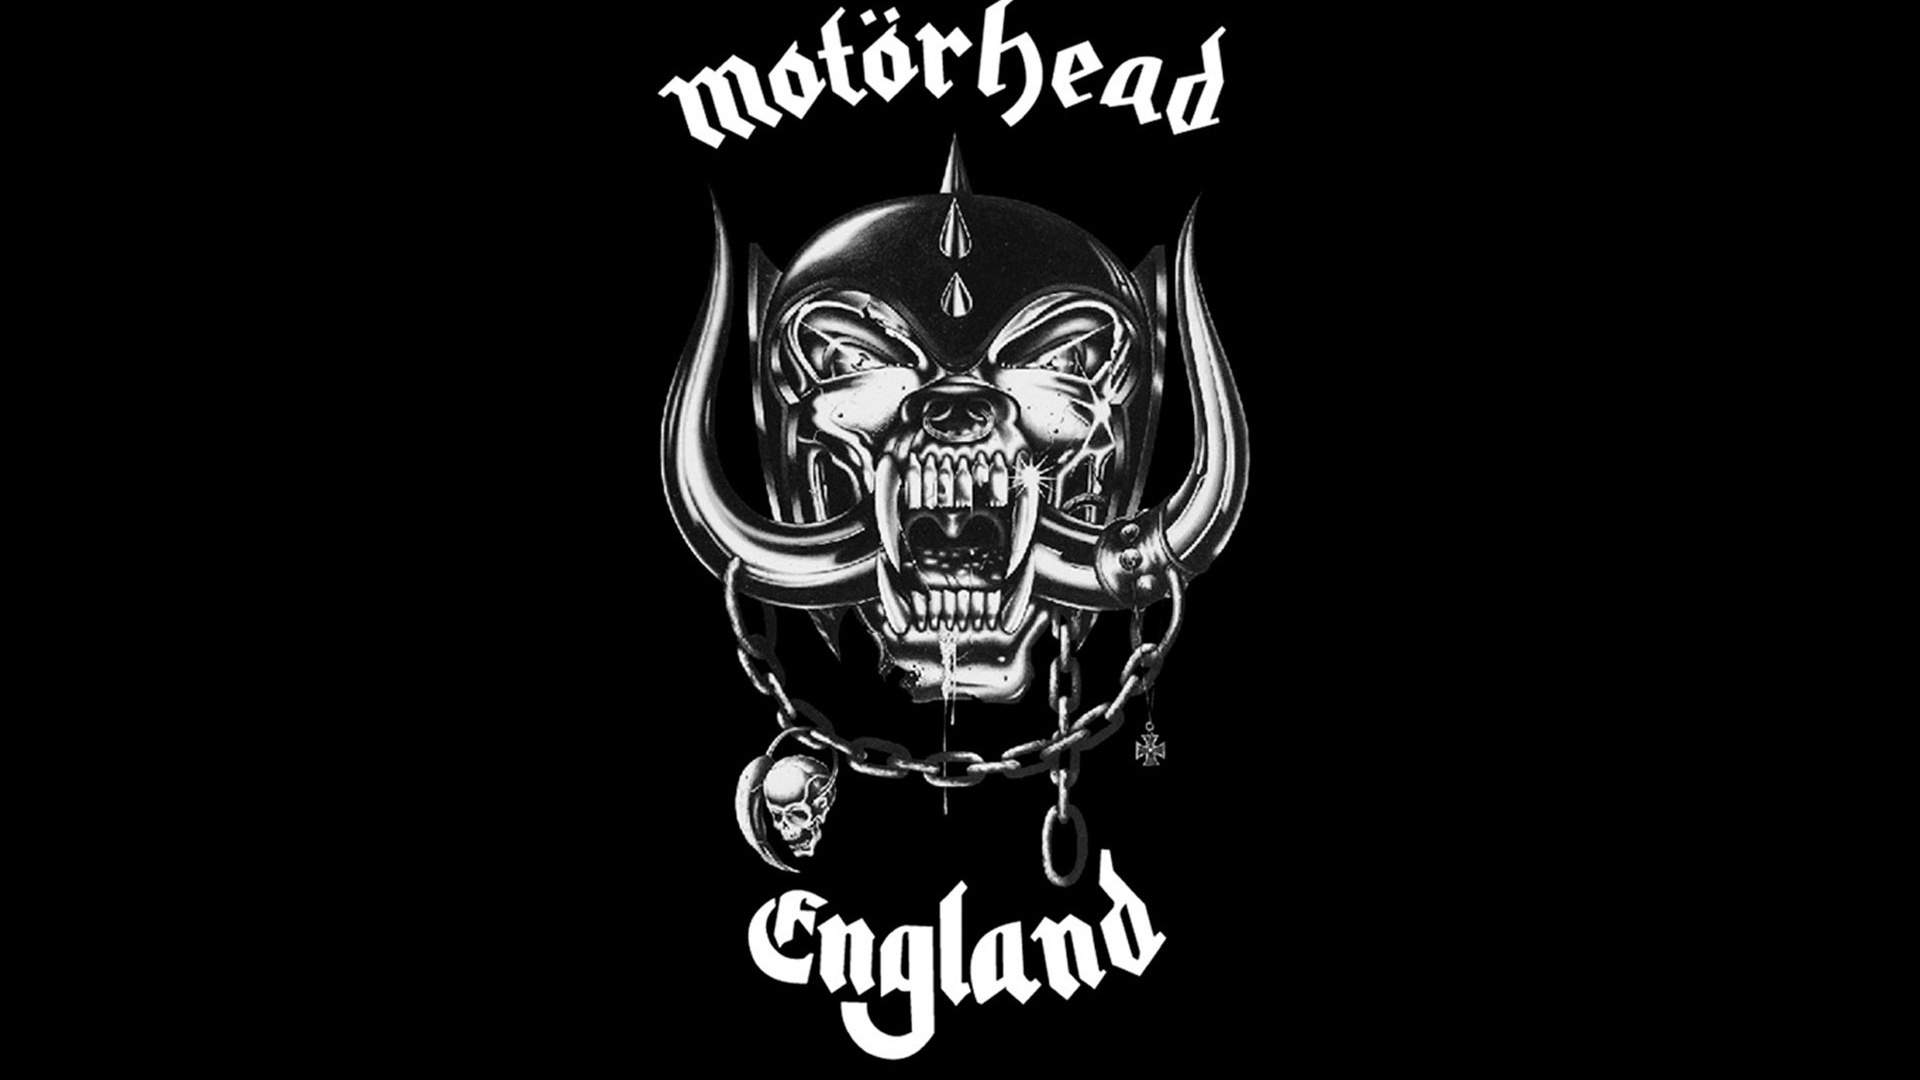 George Brannigan Shredding to Motörhead